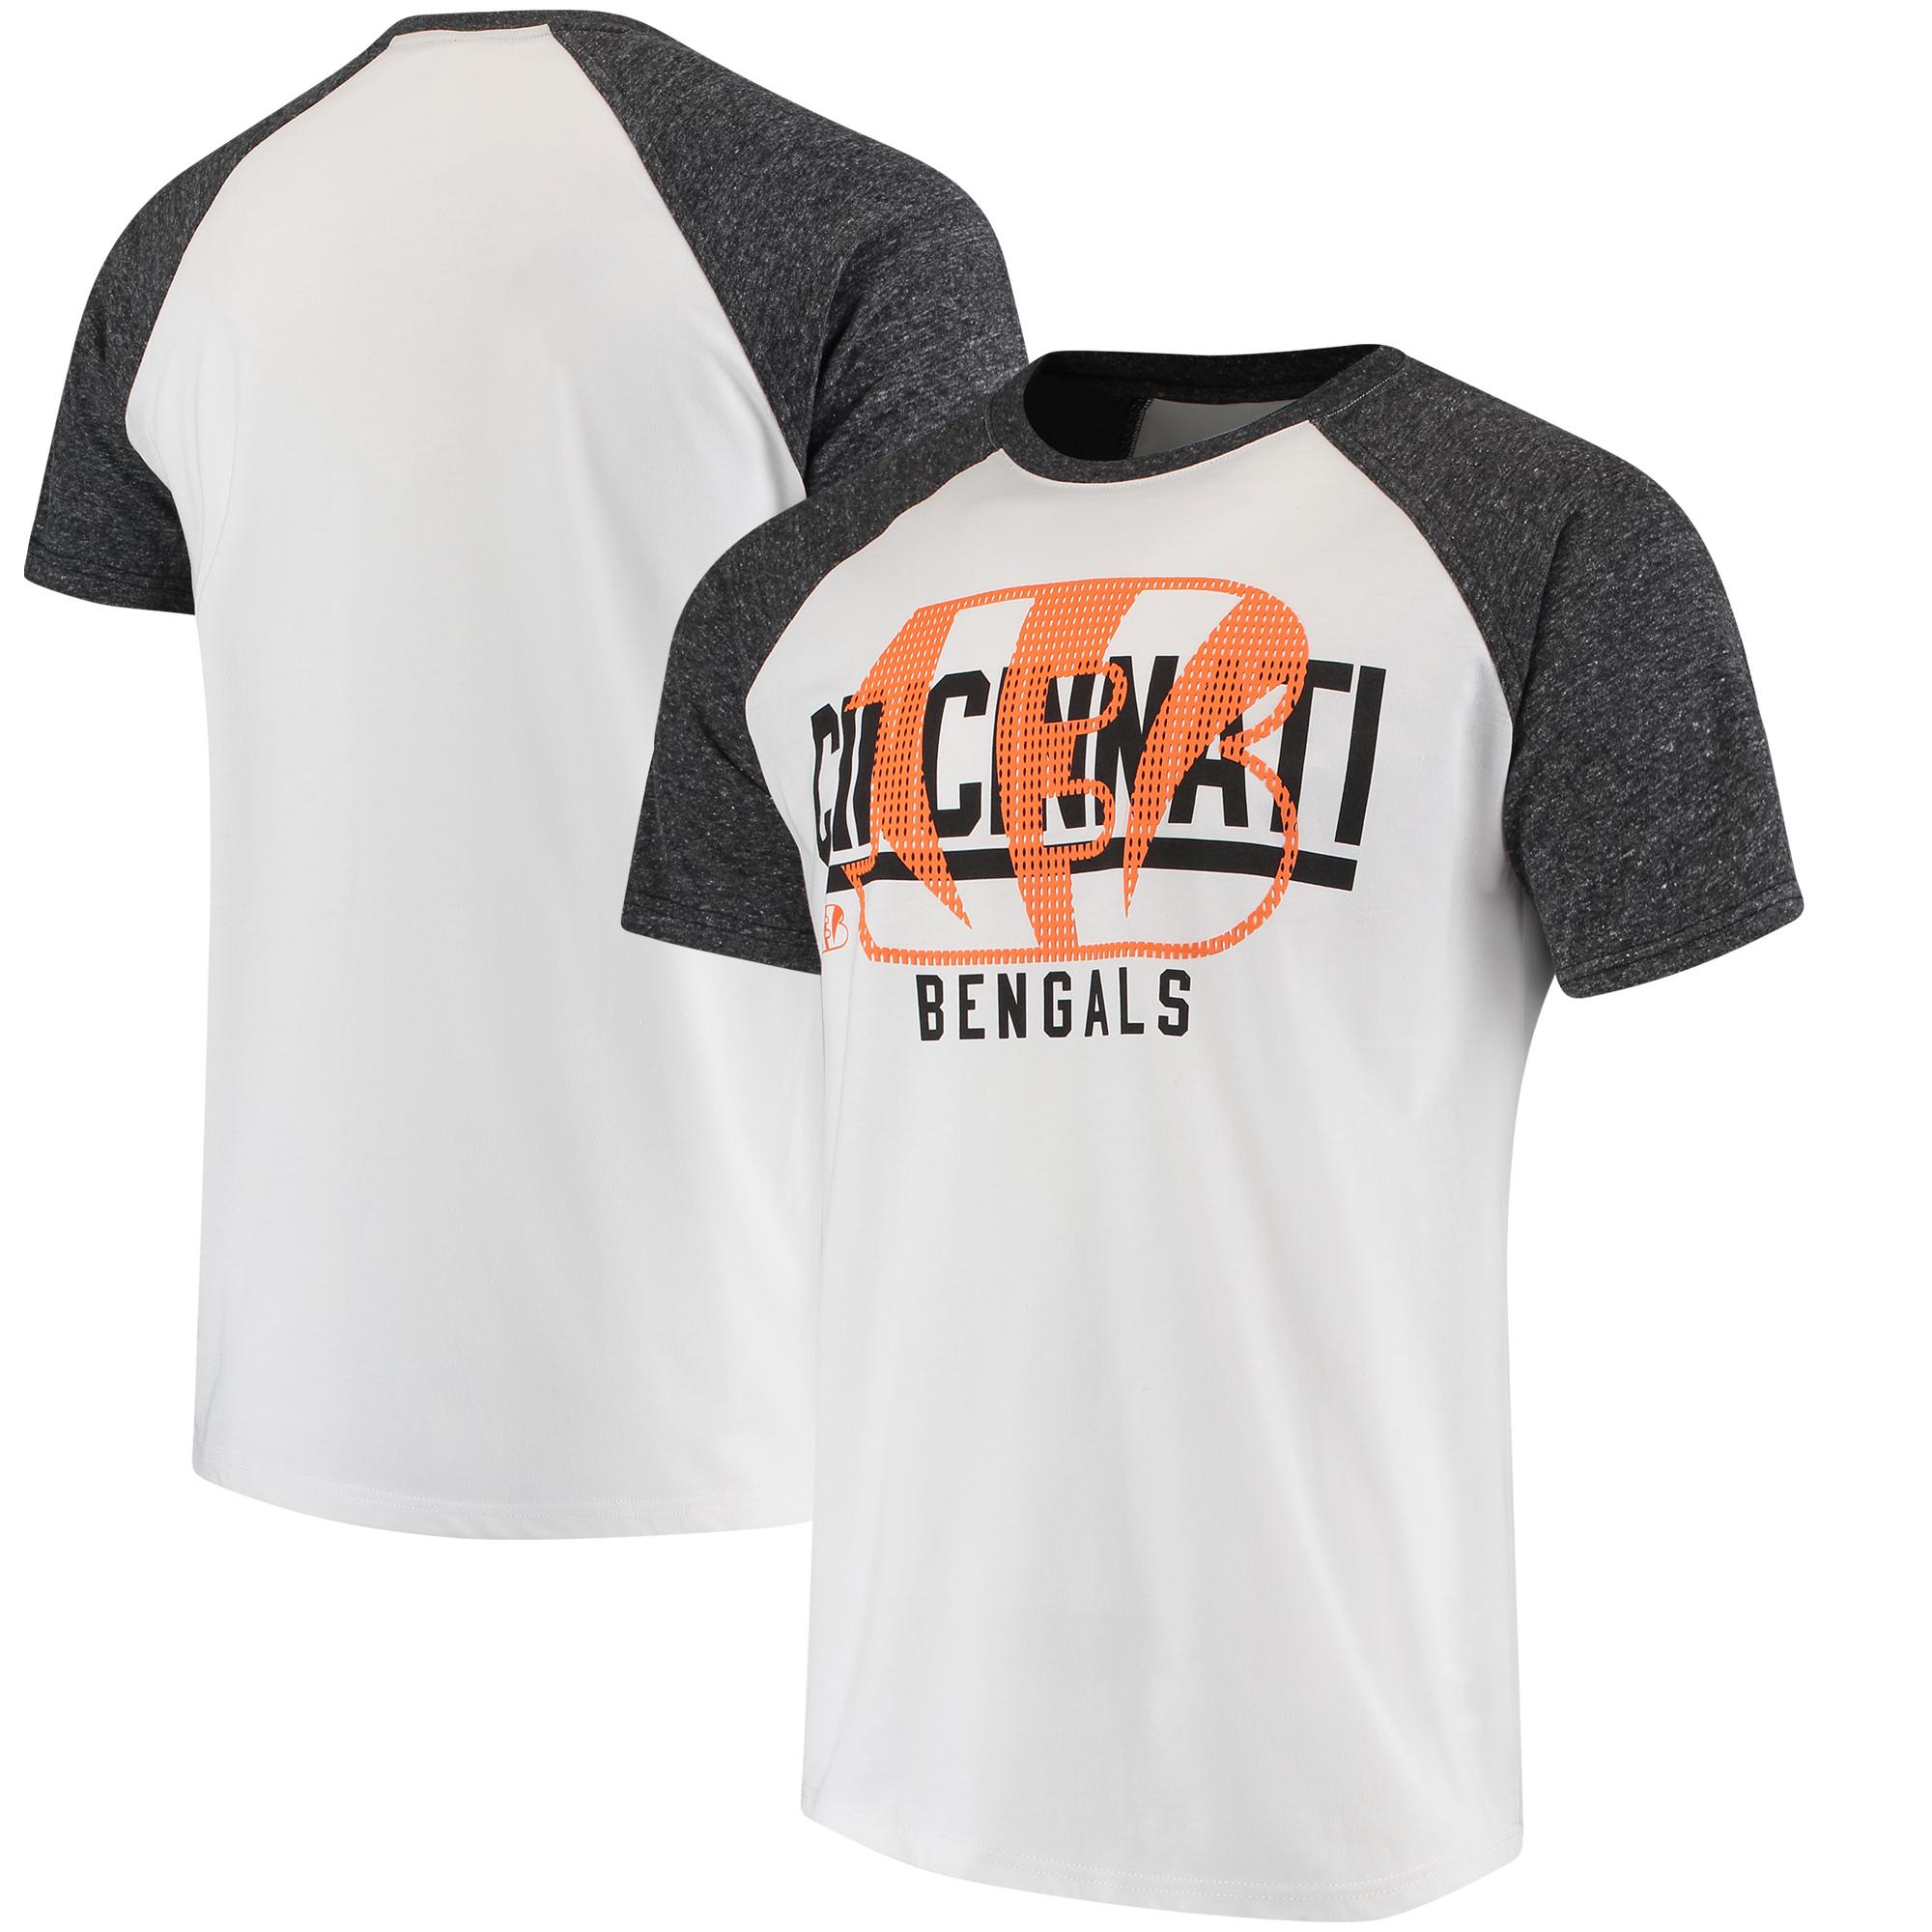 Cincinnati Bengals Hands High Heritage Raglan Tri-Blend T-Shirt - White/Heathered Gray